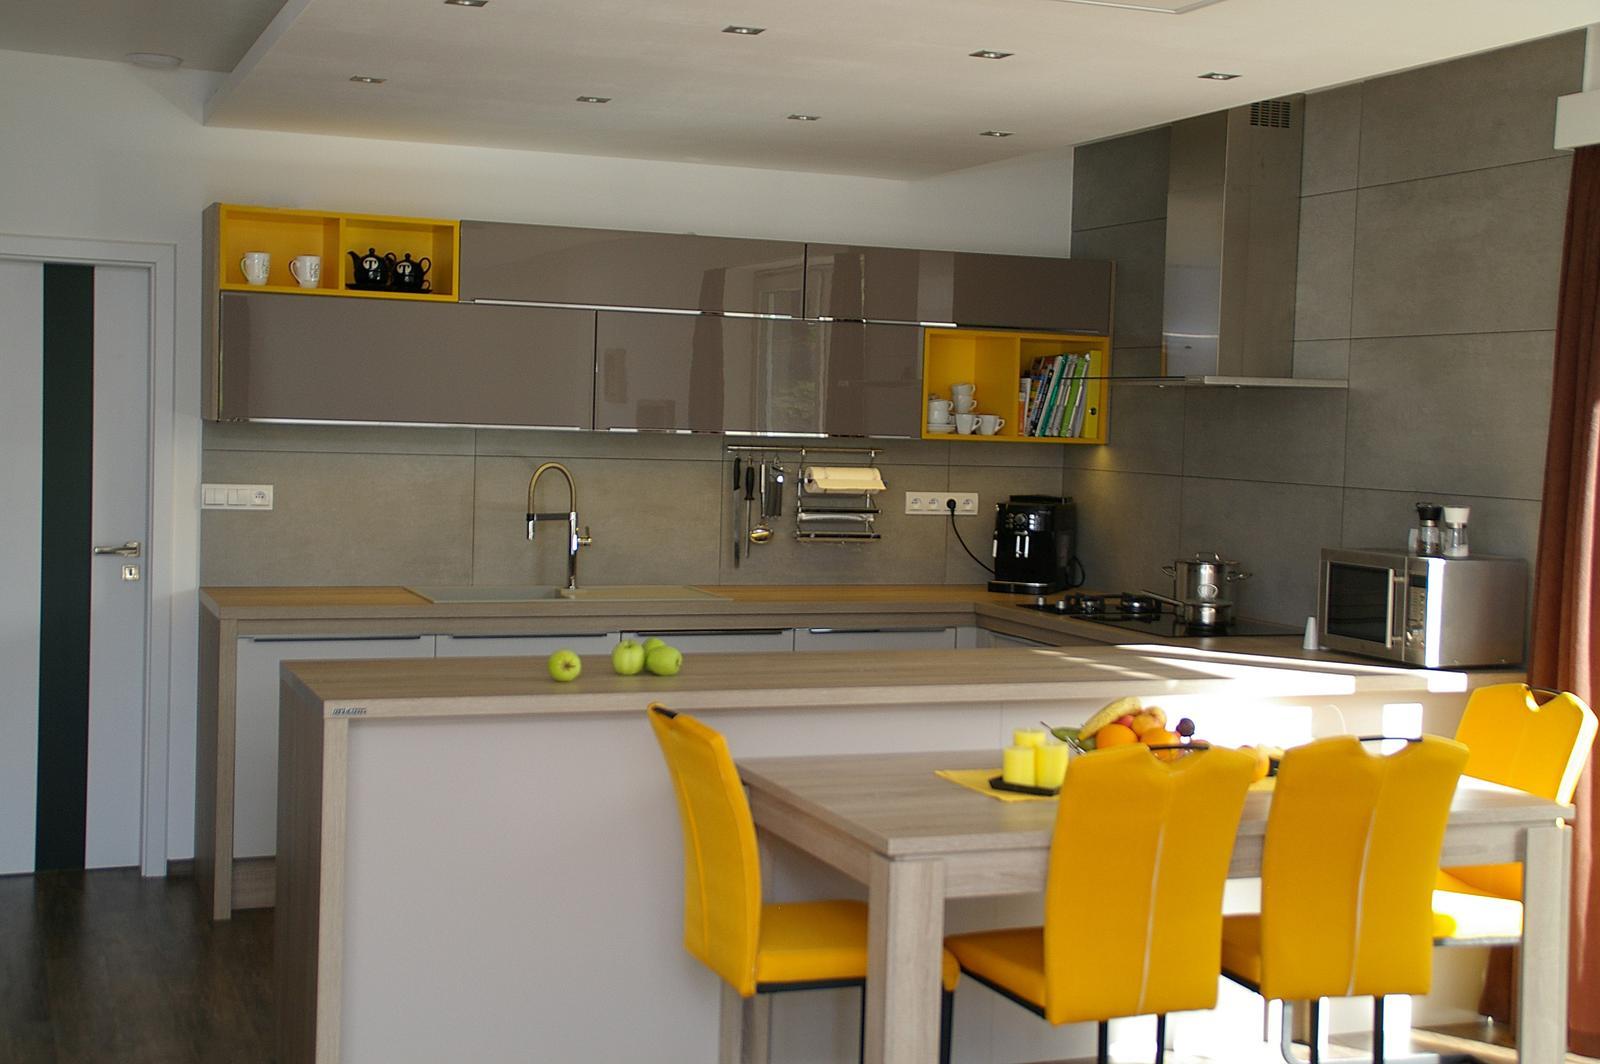 Naša kuchyňa - Obrázok č. 1